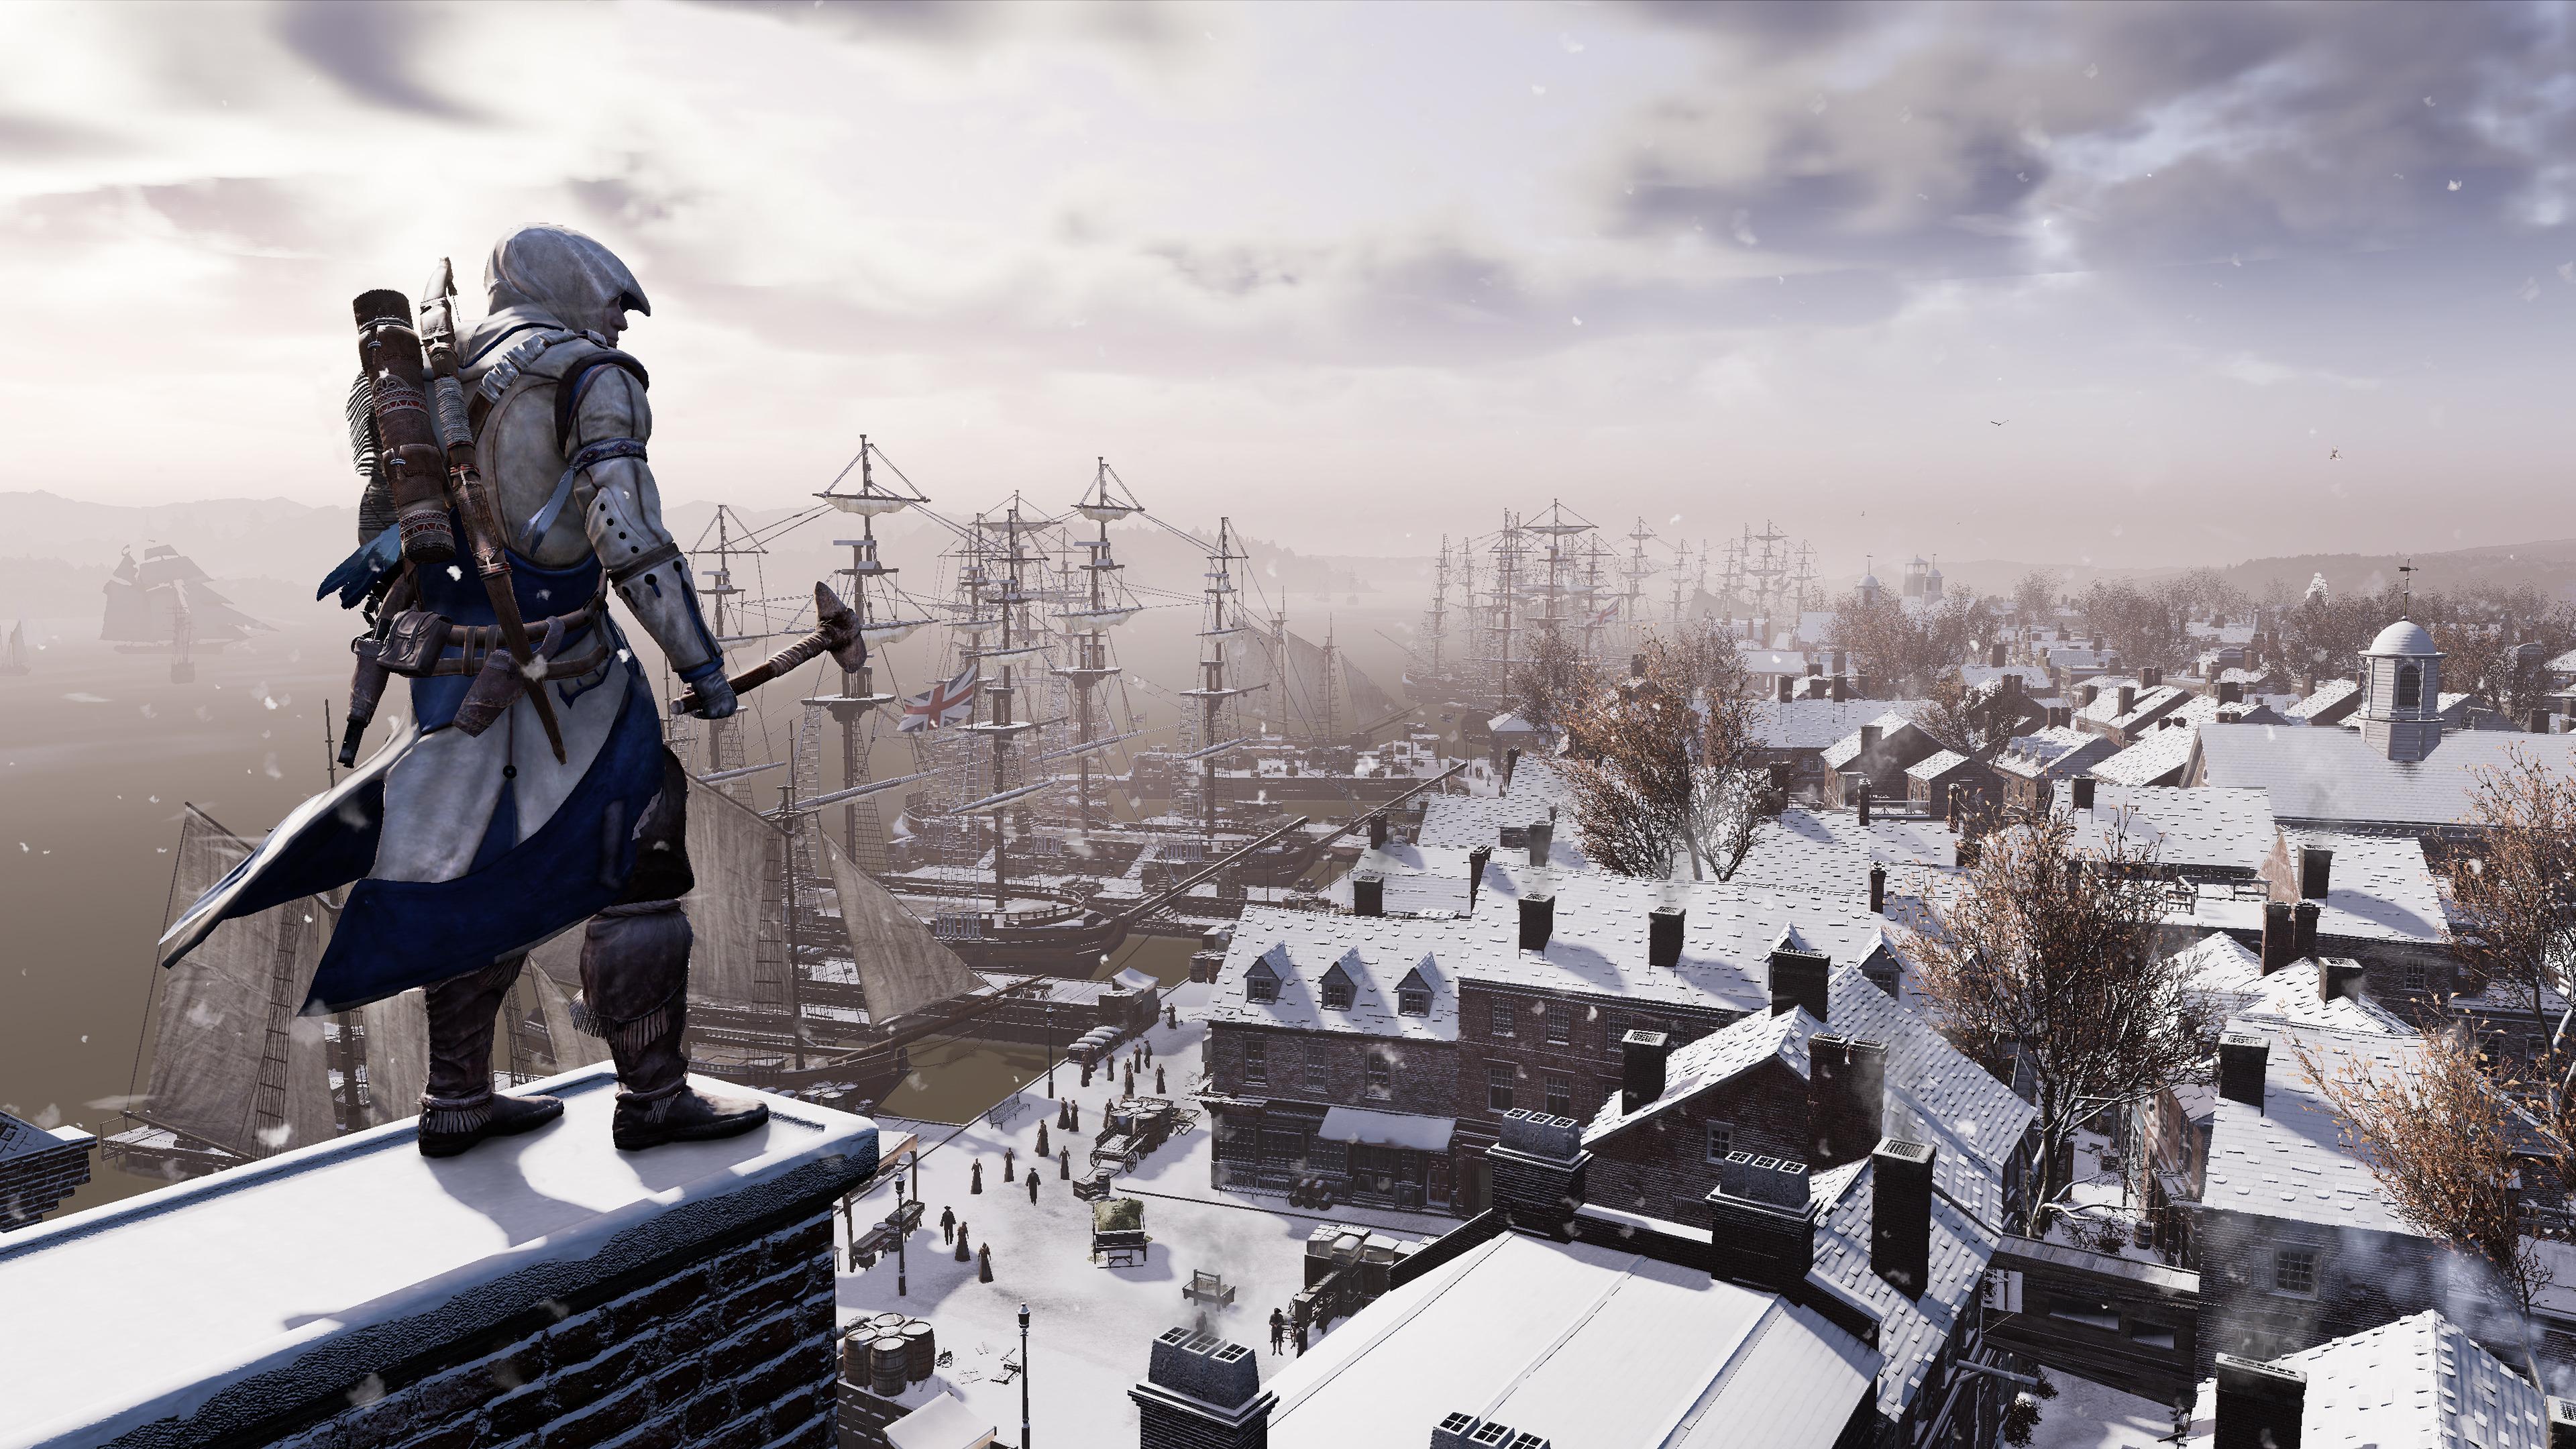 assassins creed 3 remastered 4k 1553074463 - Assassins Creed 3 Remastered 4k - hd-wallpapers, games wallpapers, assassins creed wallpapers, 4k-wallpapers